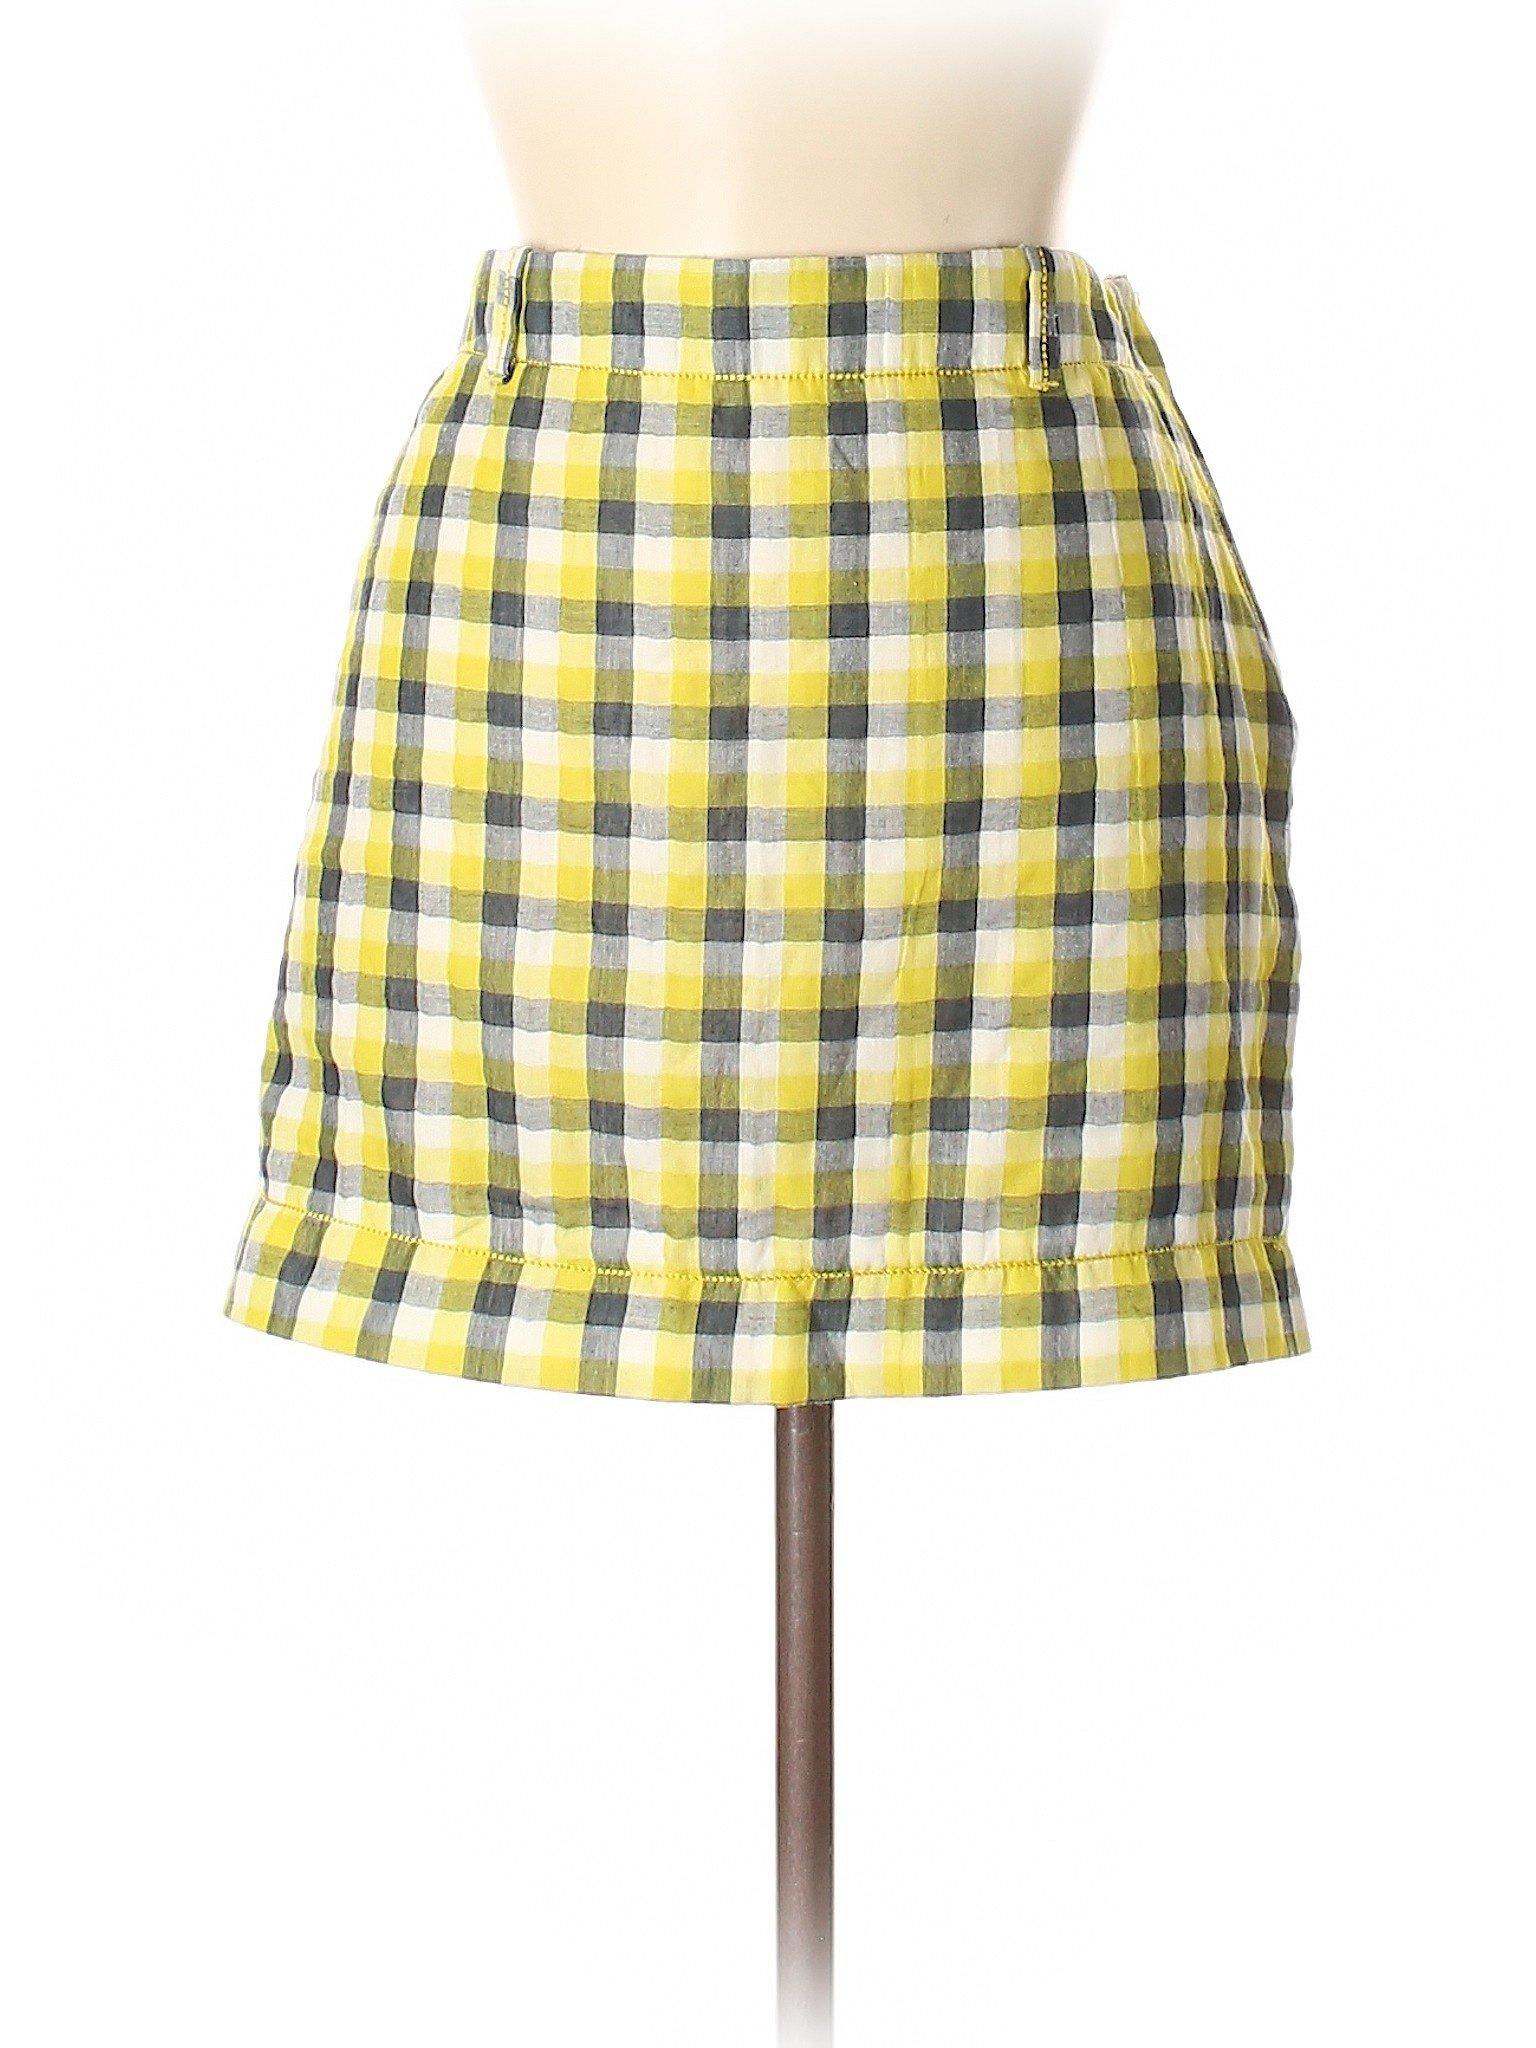 Boutique Casual Casual Skirt Boutique xqwOqTZ6U